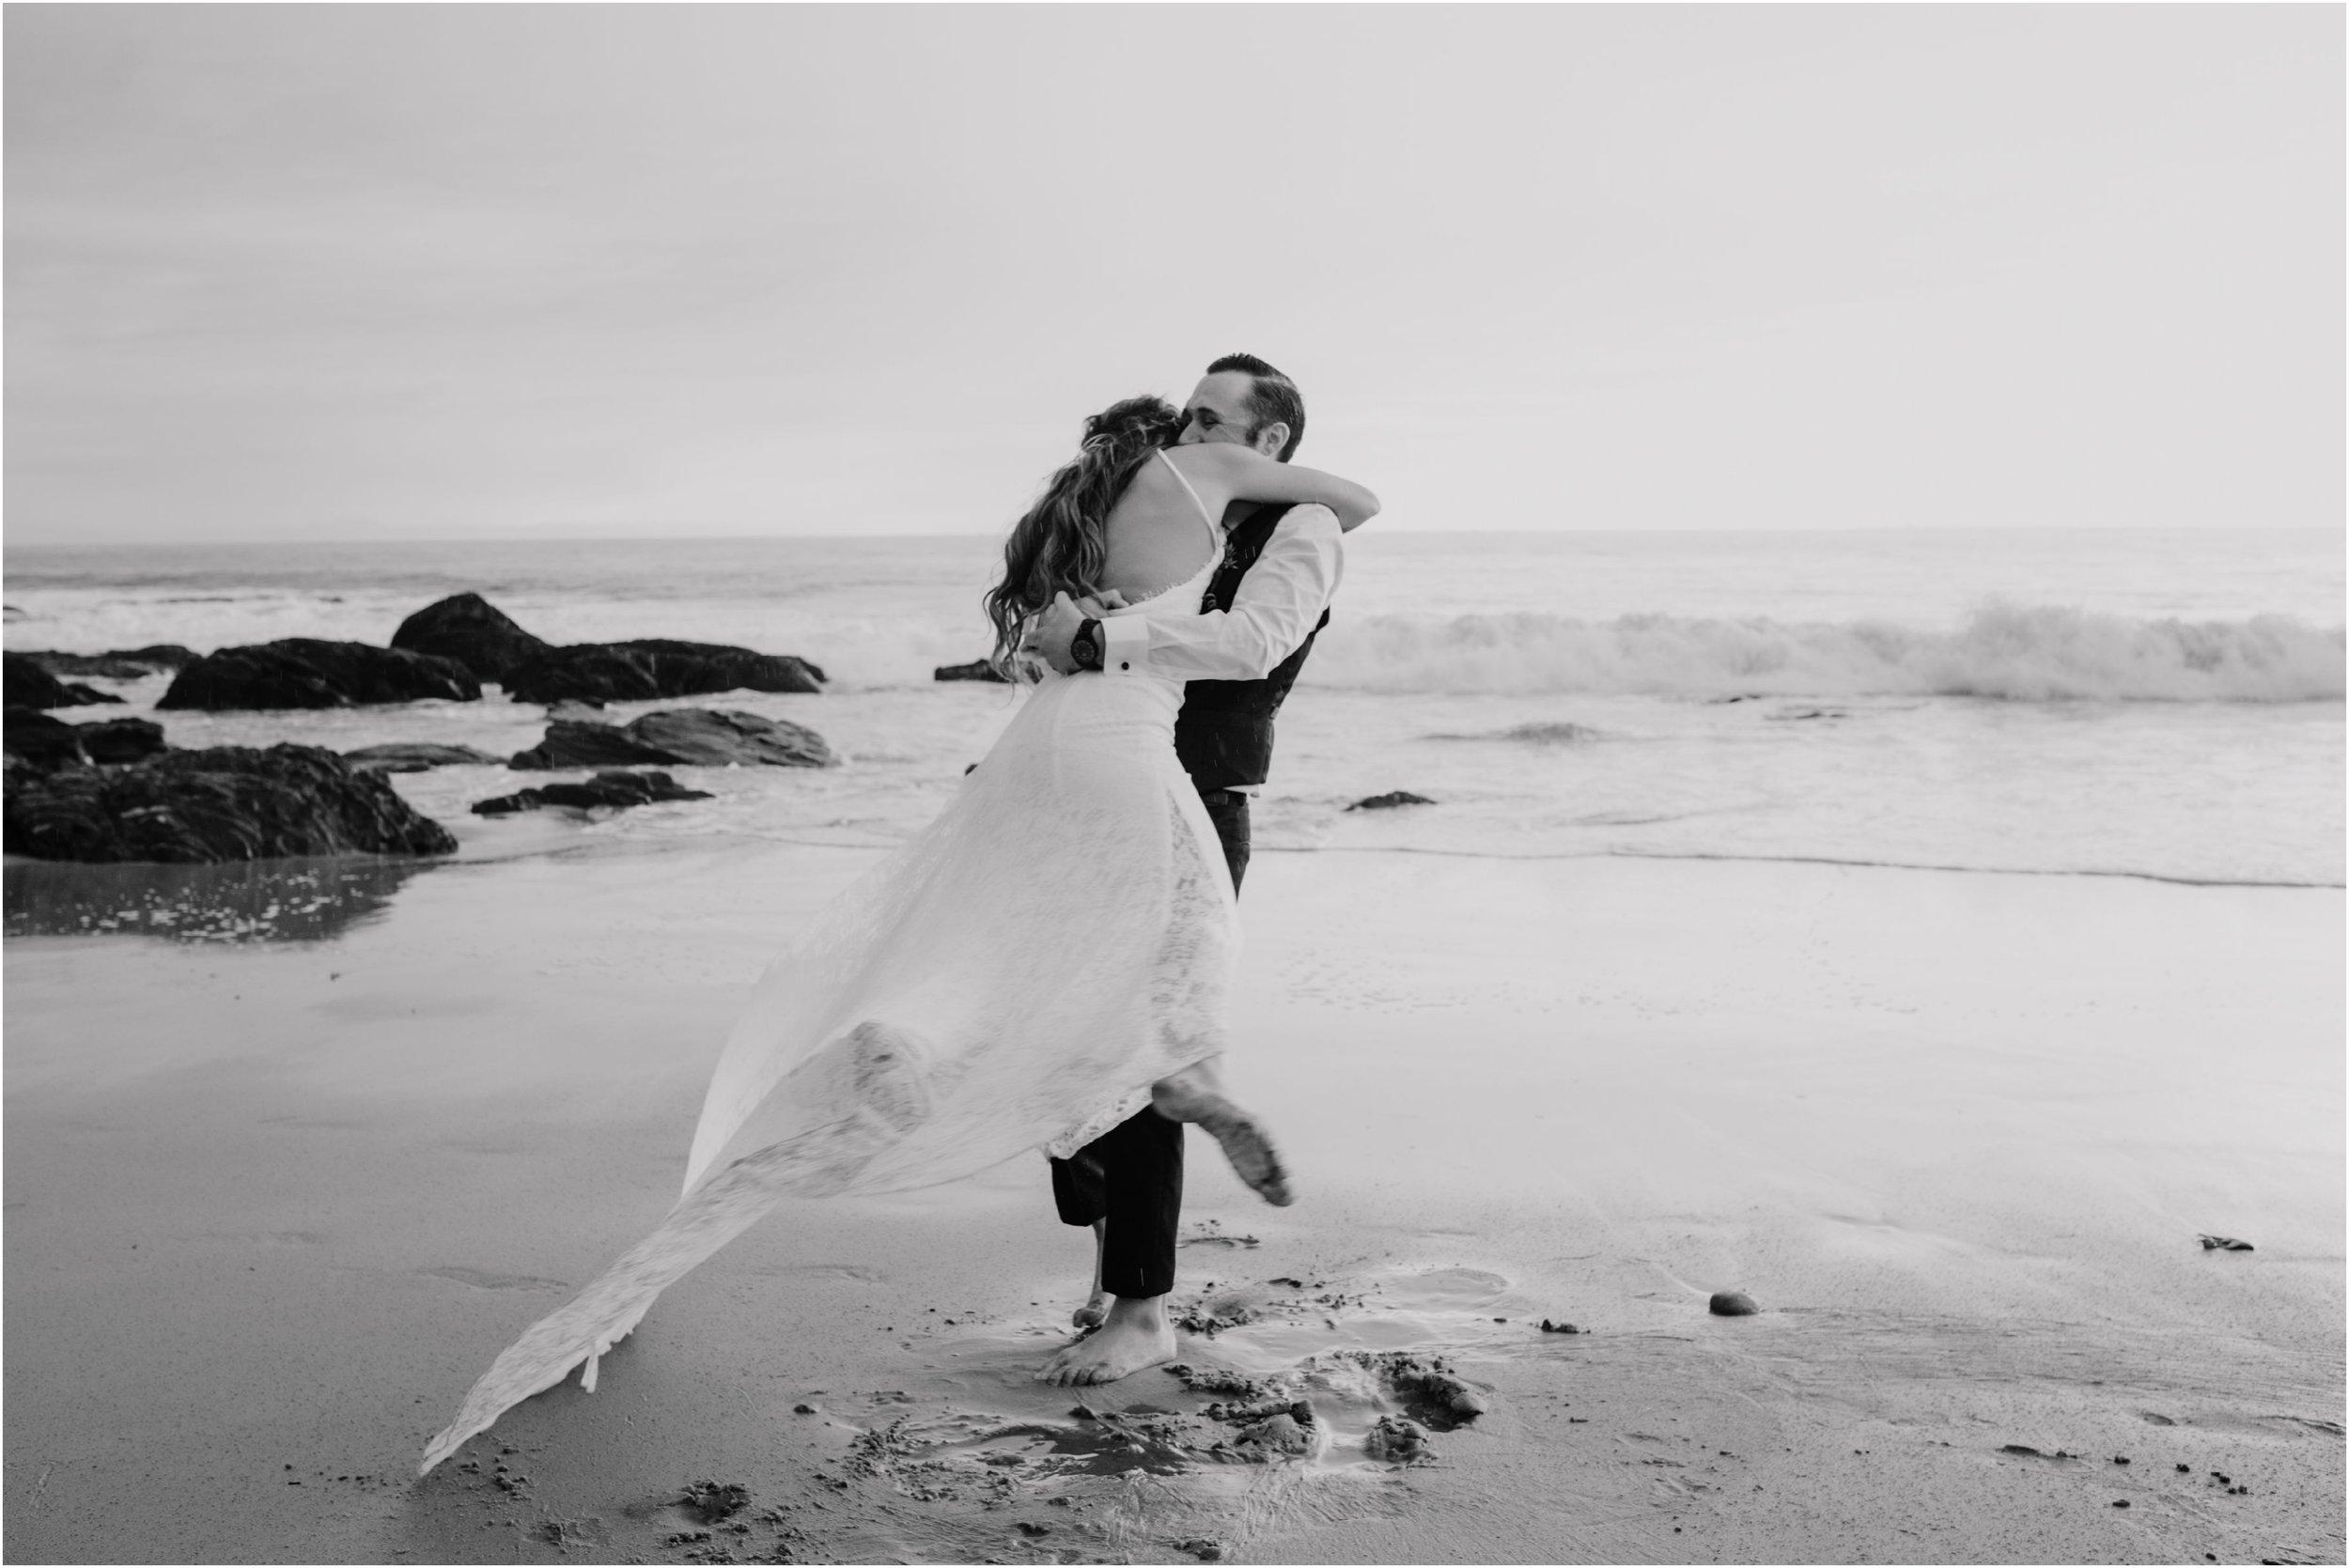 Crystal-Cove-Wedding-I&S-Diana-Lake-Photography-902.jpg